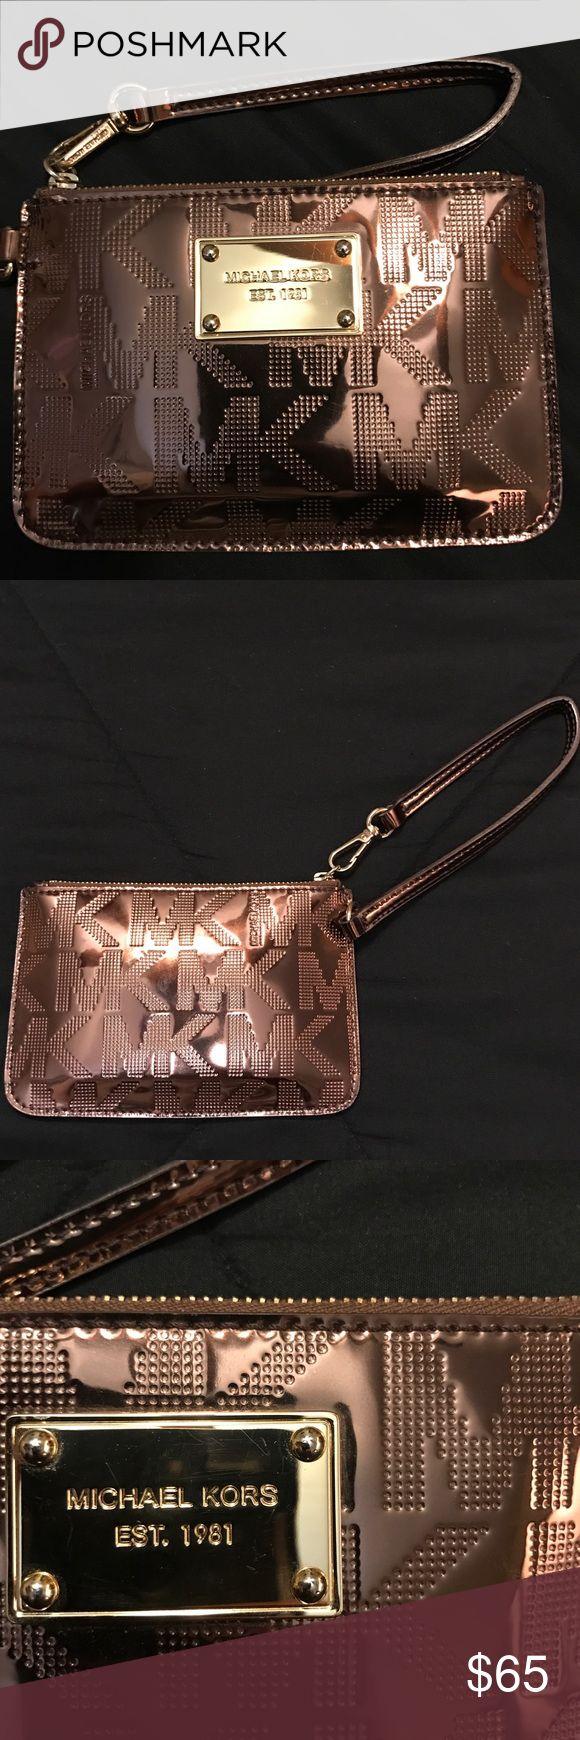 Michael Kors clutch Michael Kors copper metallic & gold clutch Michael Kors Bags Clutches & Wristlets